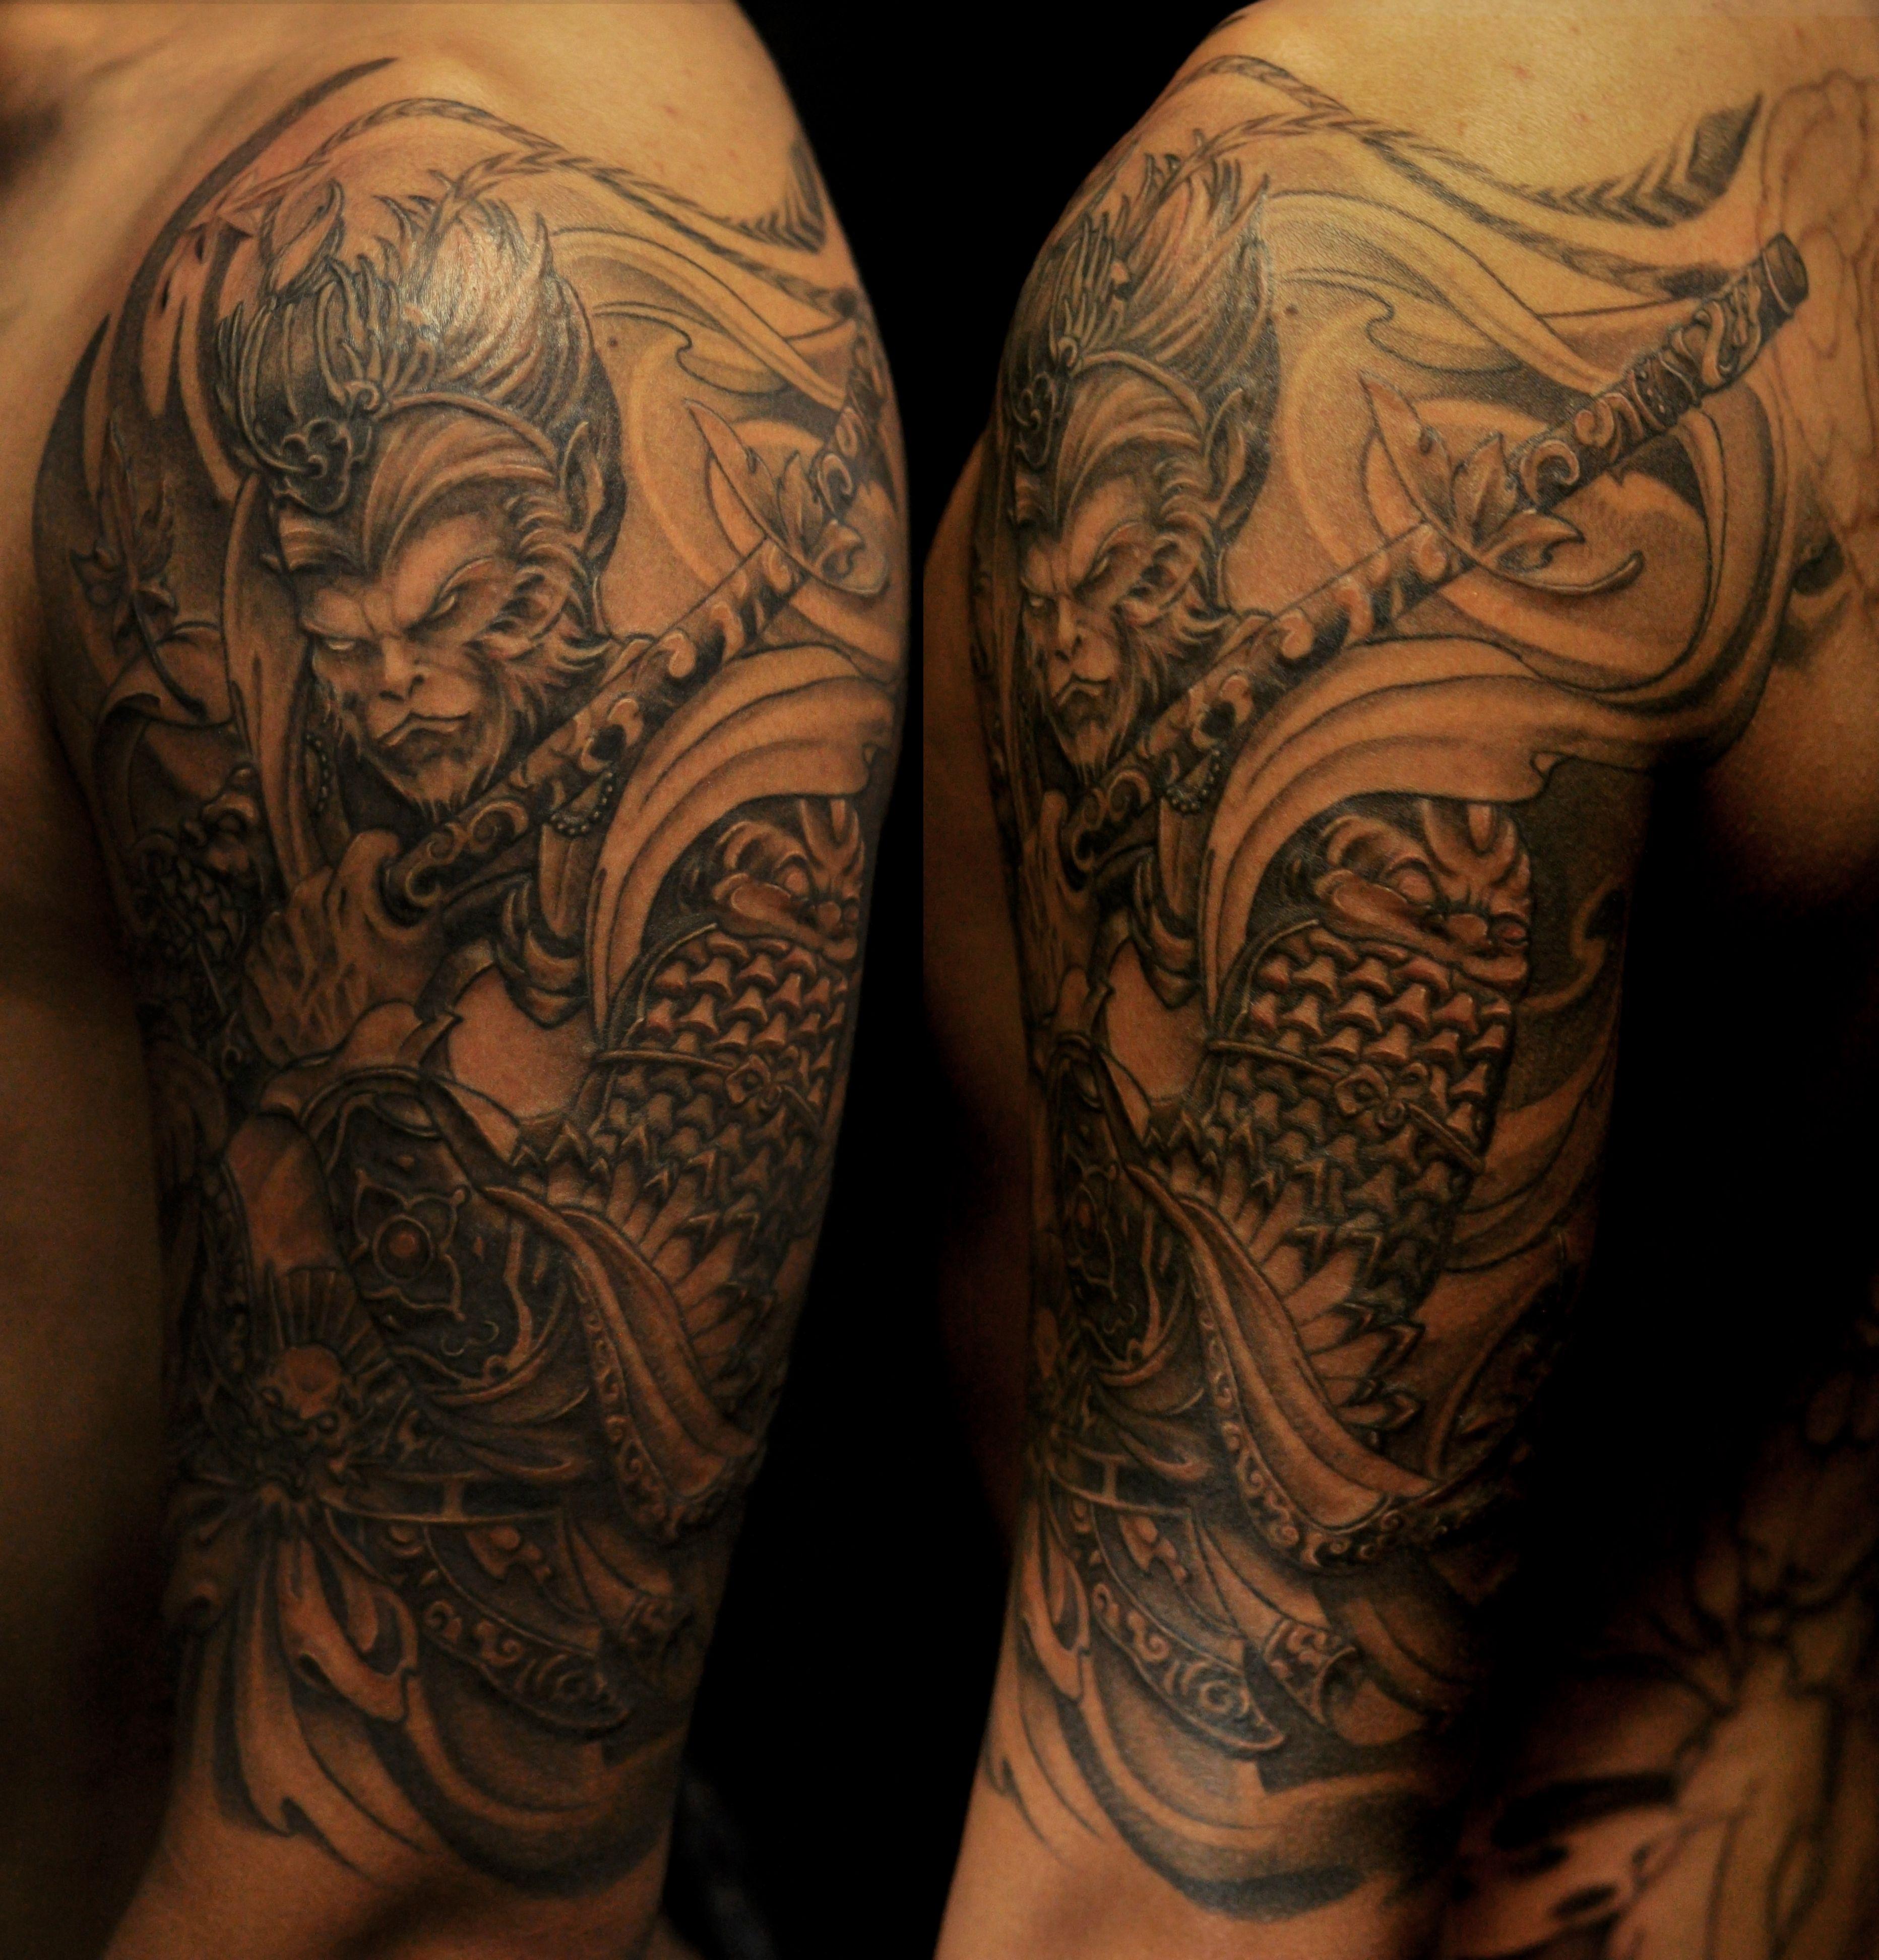 Half sleeve Monkey King tattoo - Chronic Ink | Monkey King ...